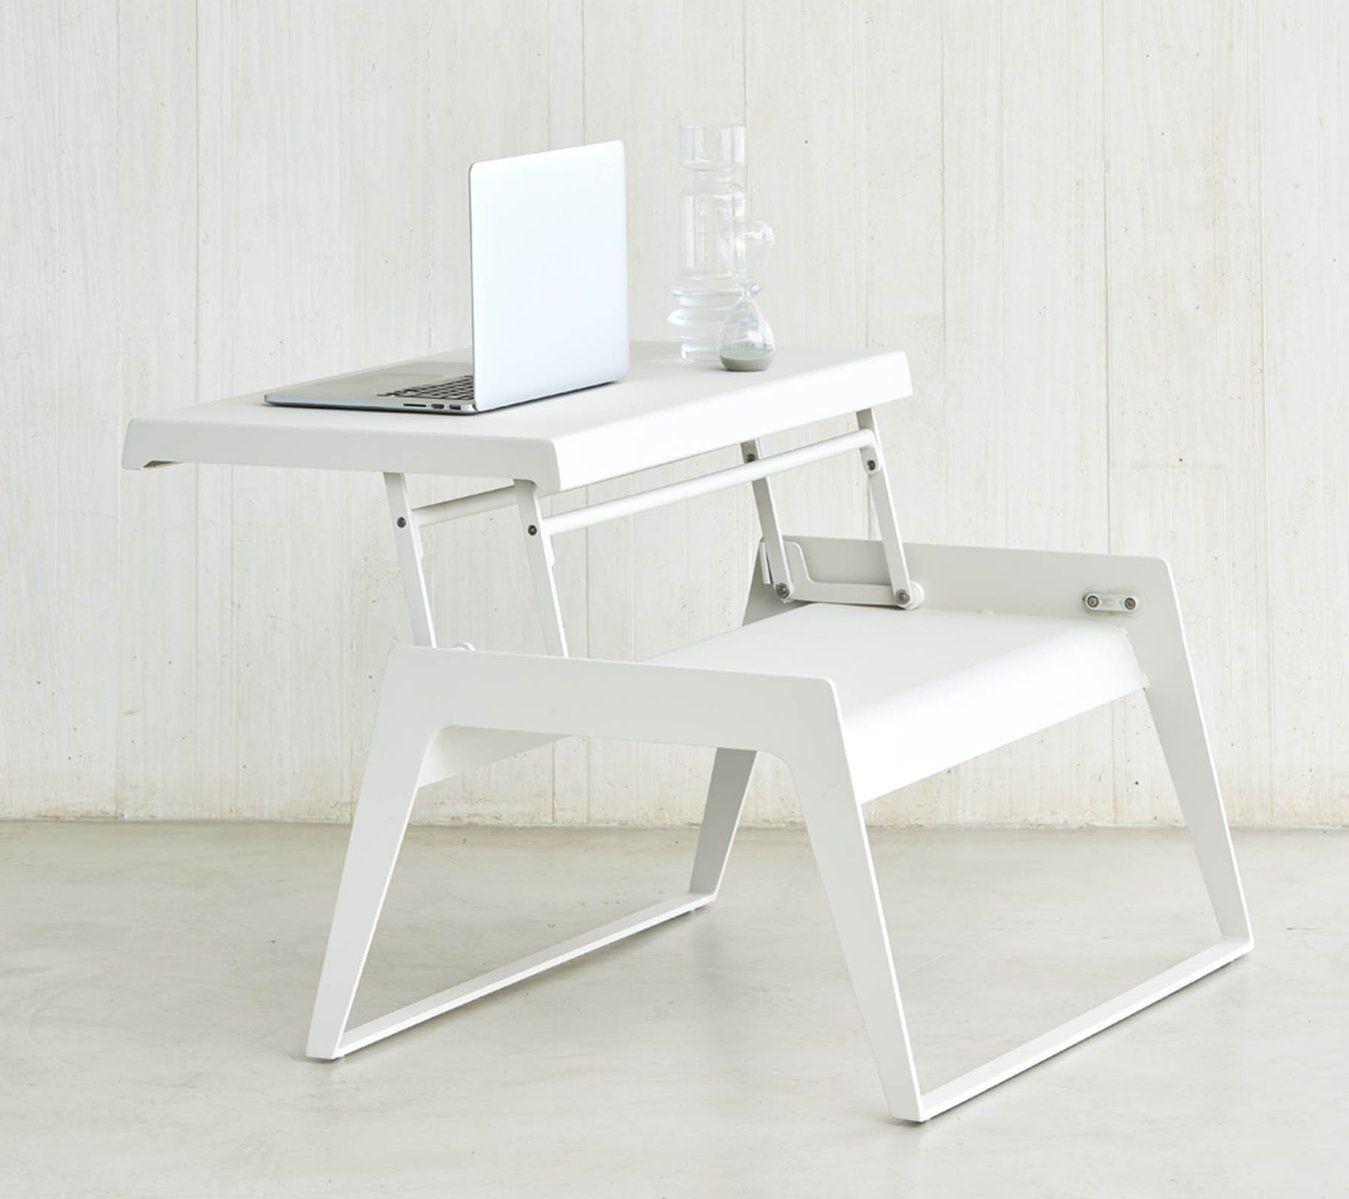 Table Basse Contemporaine / En Aluminium / Rectangulaire ... pour Desserte Jardin Plastique